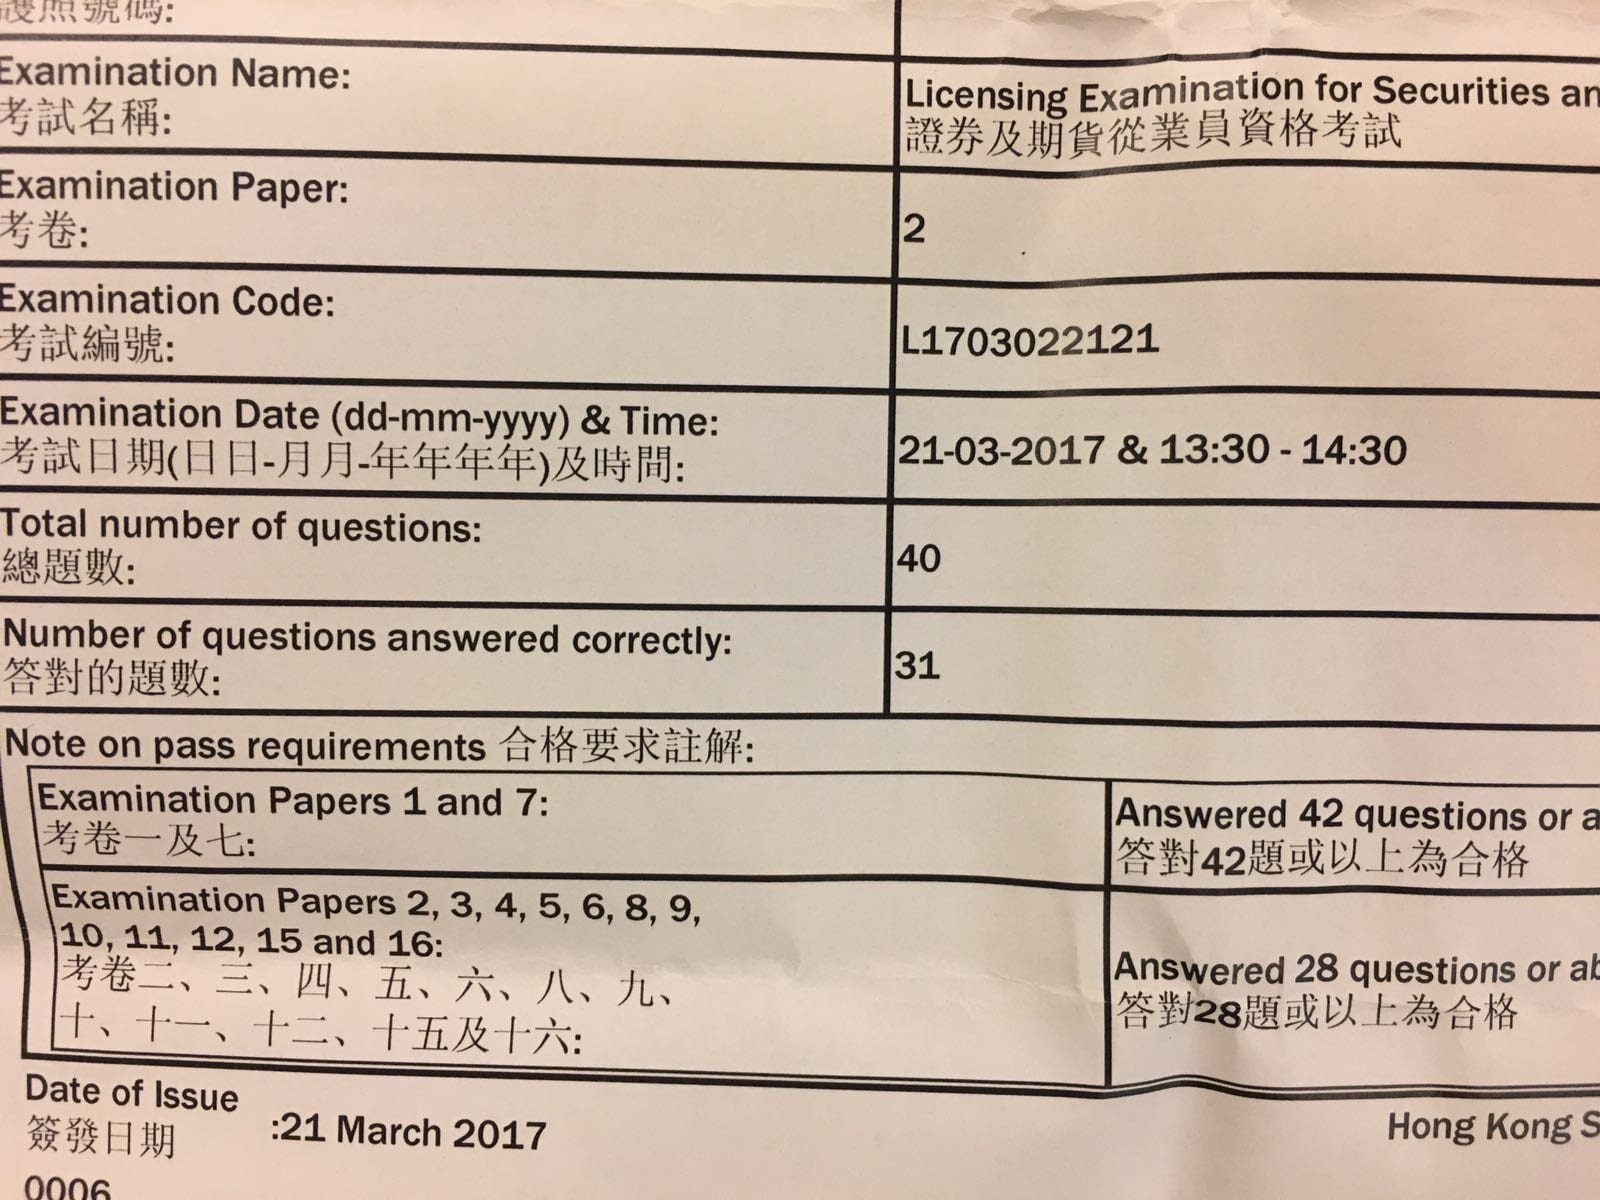 LHL 21/3/2017 LE Paper 2 證券期貨從業員資格考試卷二 Pass